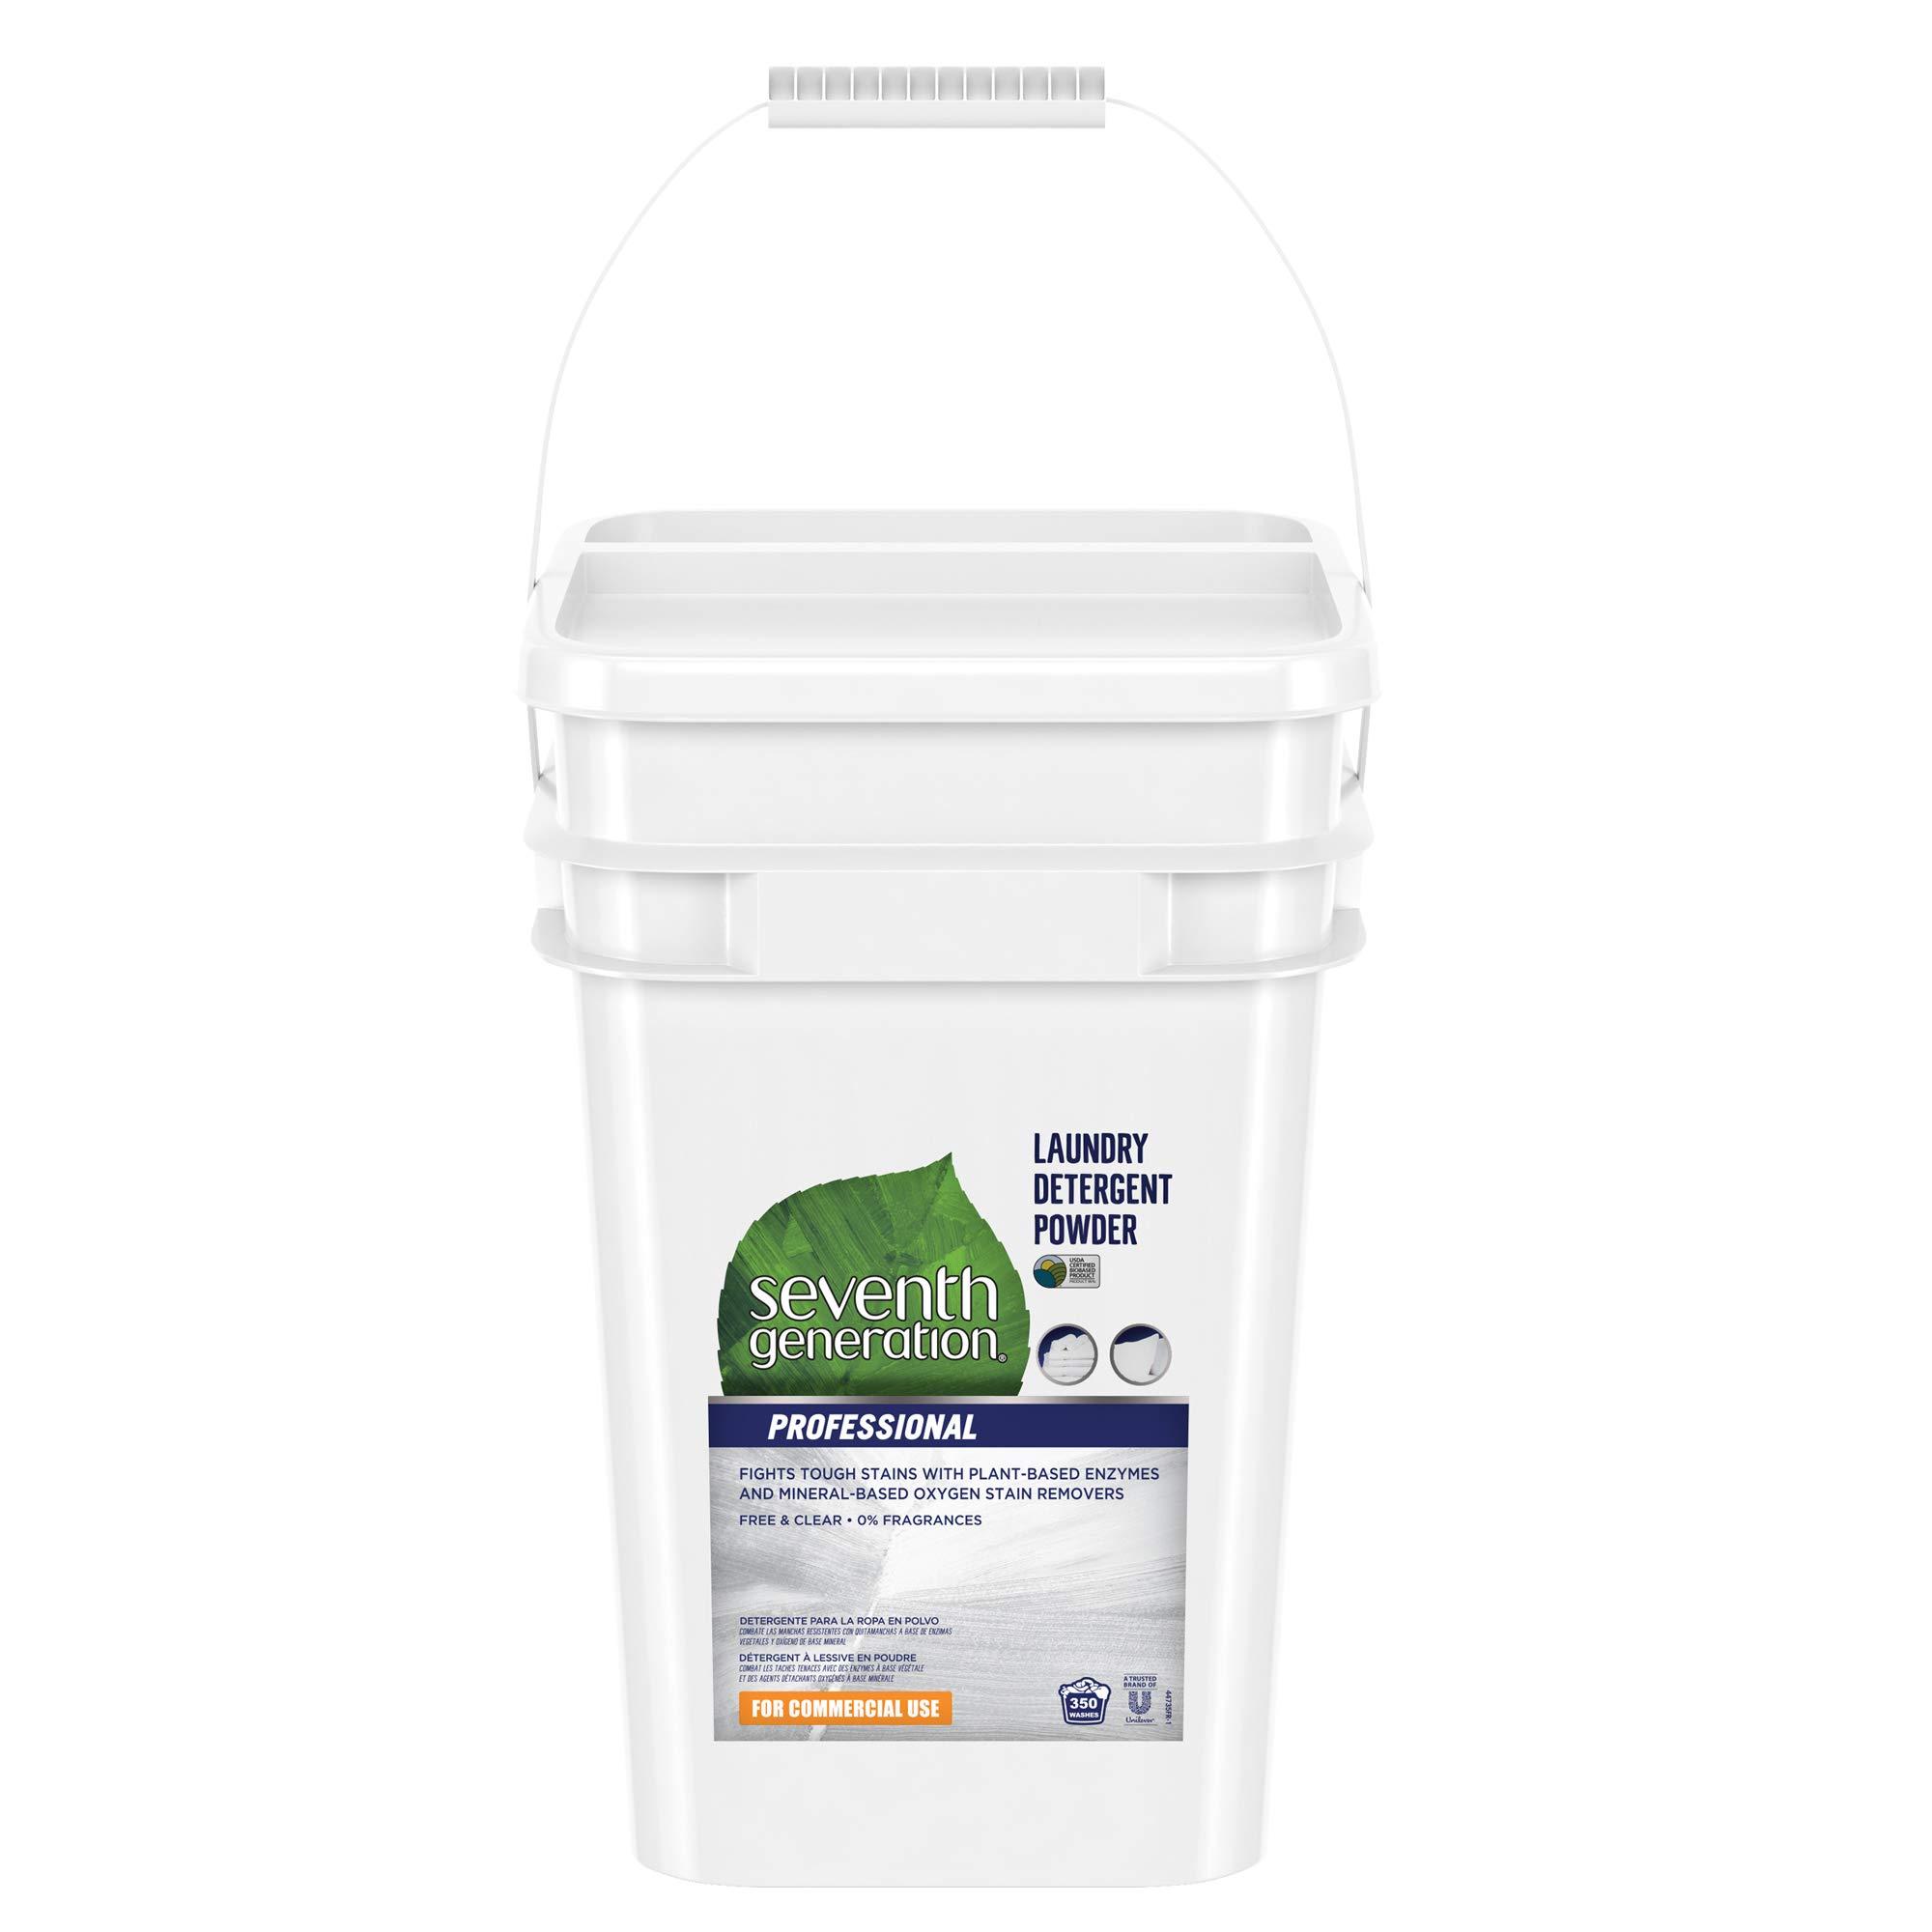 Seventh Generation Professional Laundry Detergent Powder, Unscented, 35 Pound